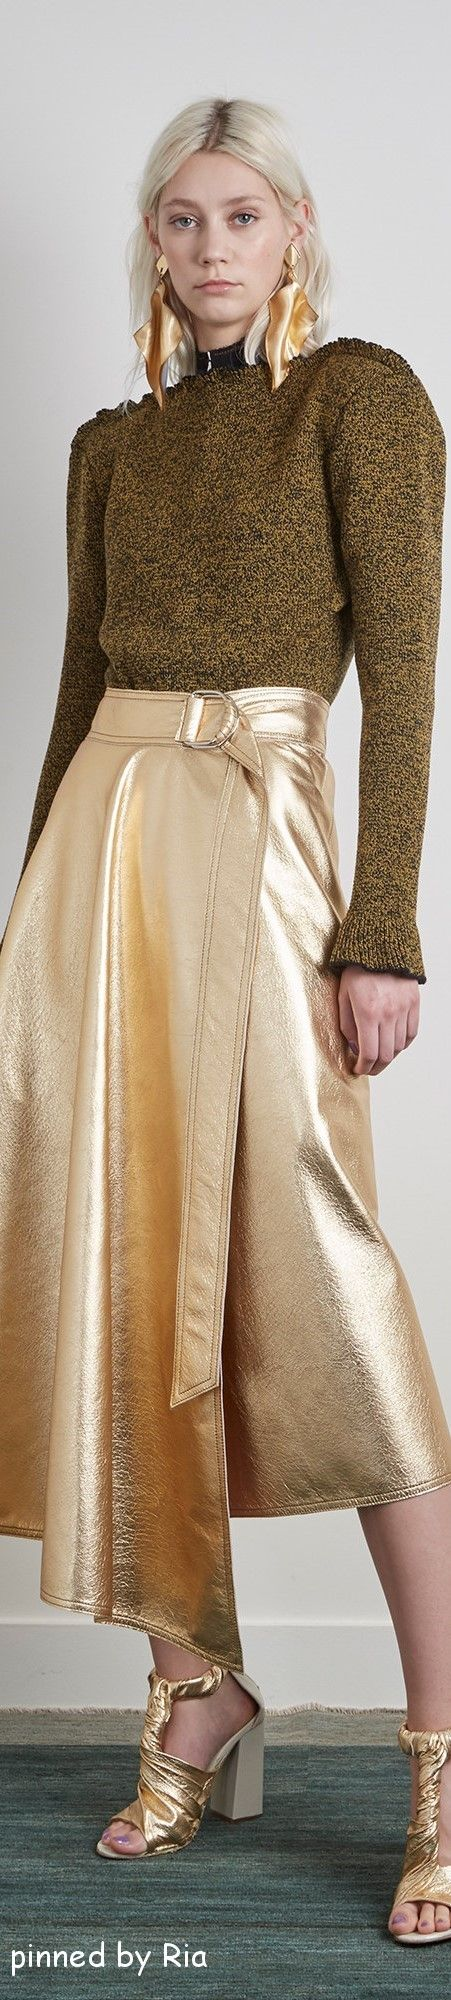 Veronique Leroy Pre Fall 2016 l Ria women fashion outfit clothing style apparel @roressclothes closet ideas